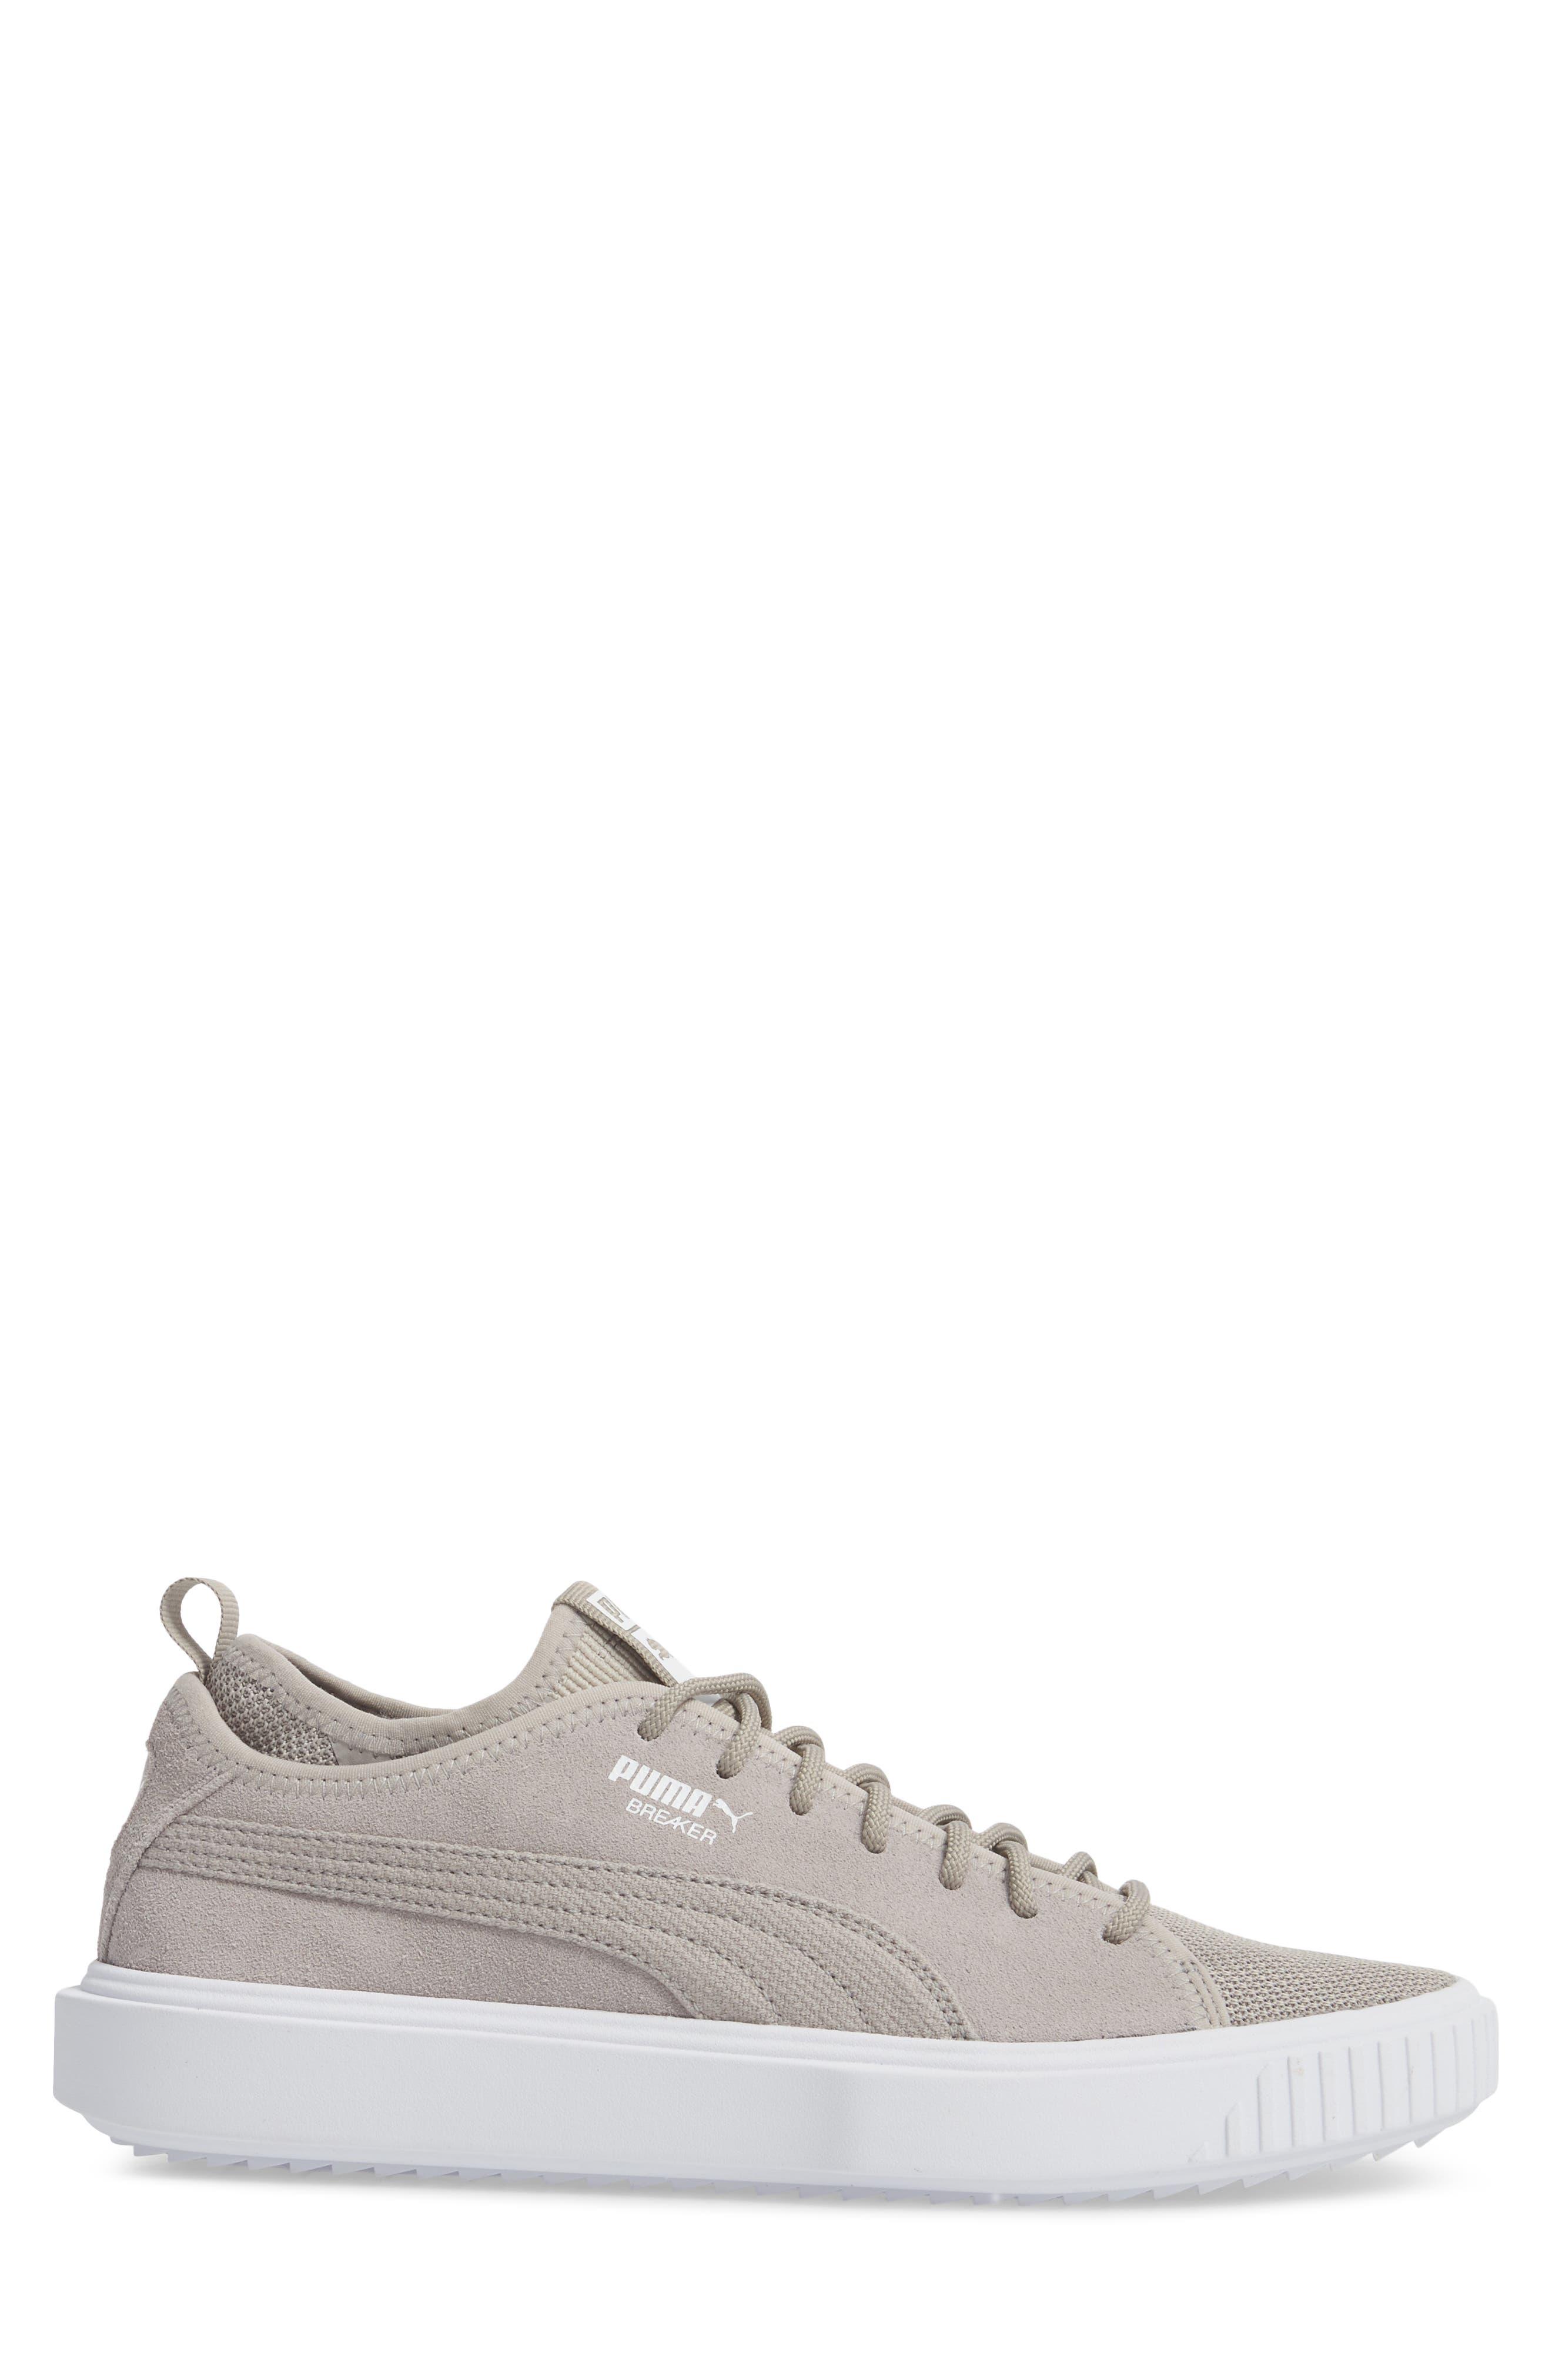 Breaker Mesh Sneaker,                             Alternate thumbnail 3, color,                             Ash/ White Suede